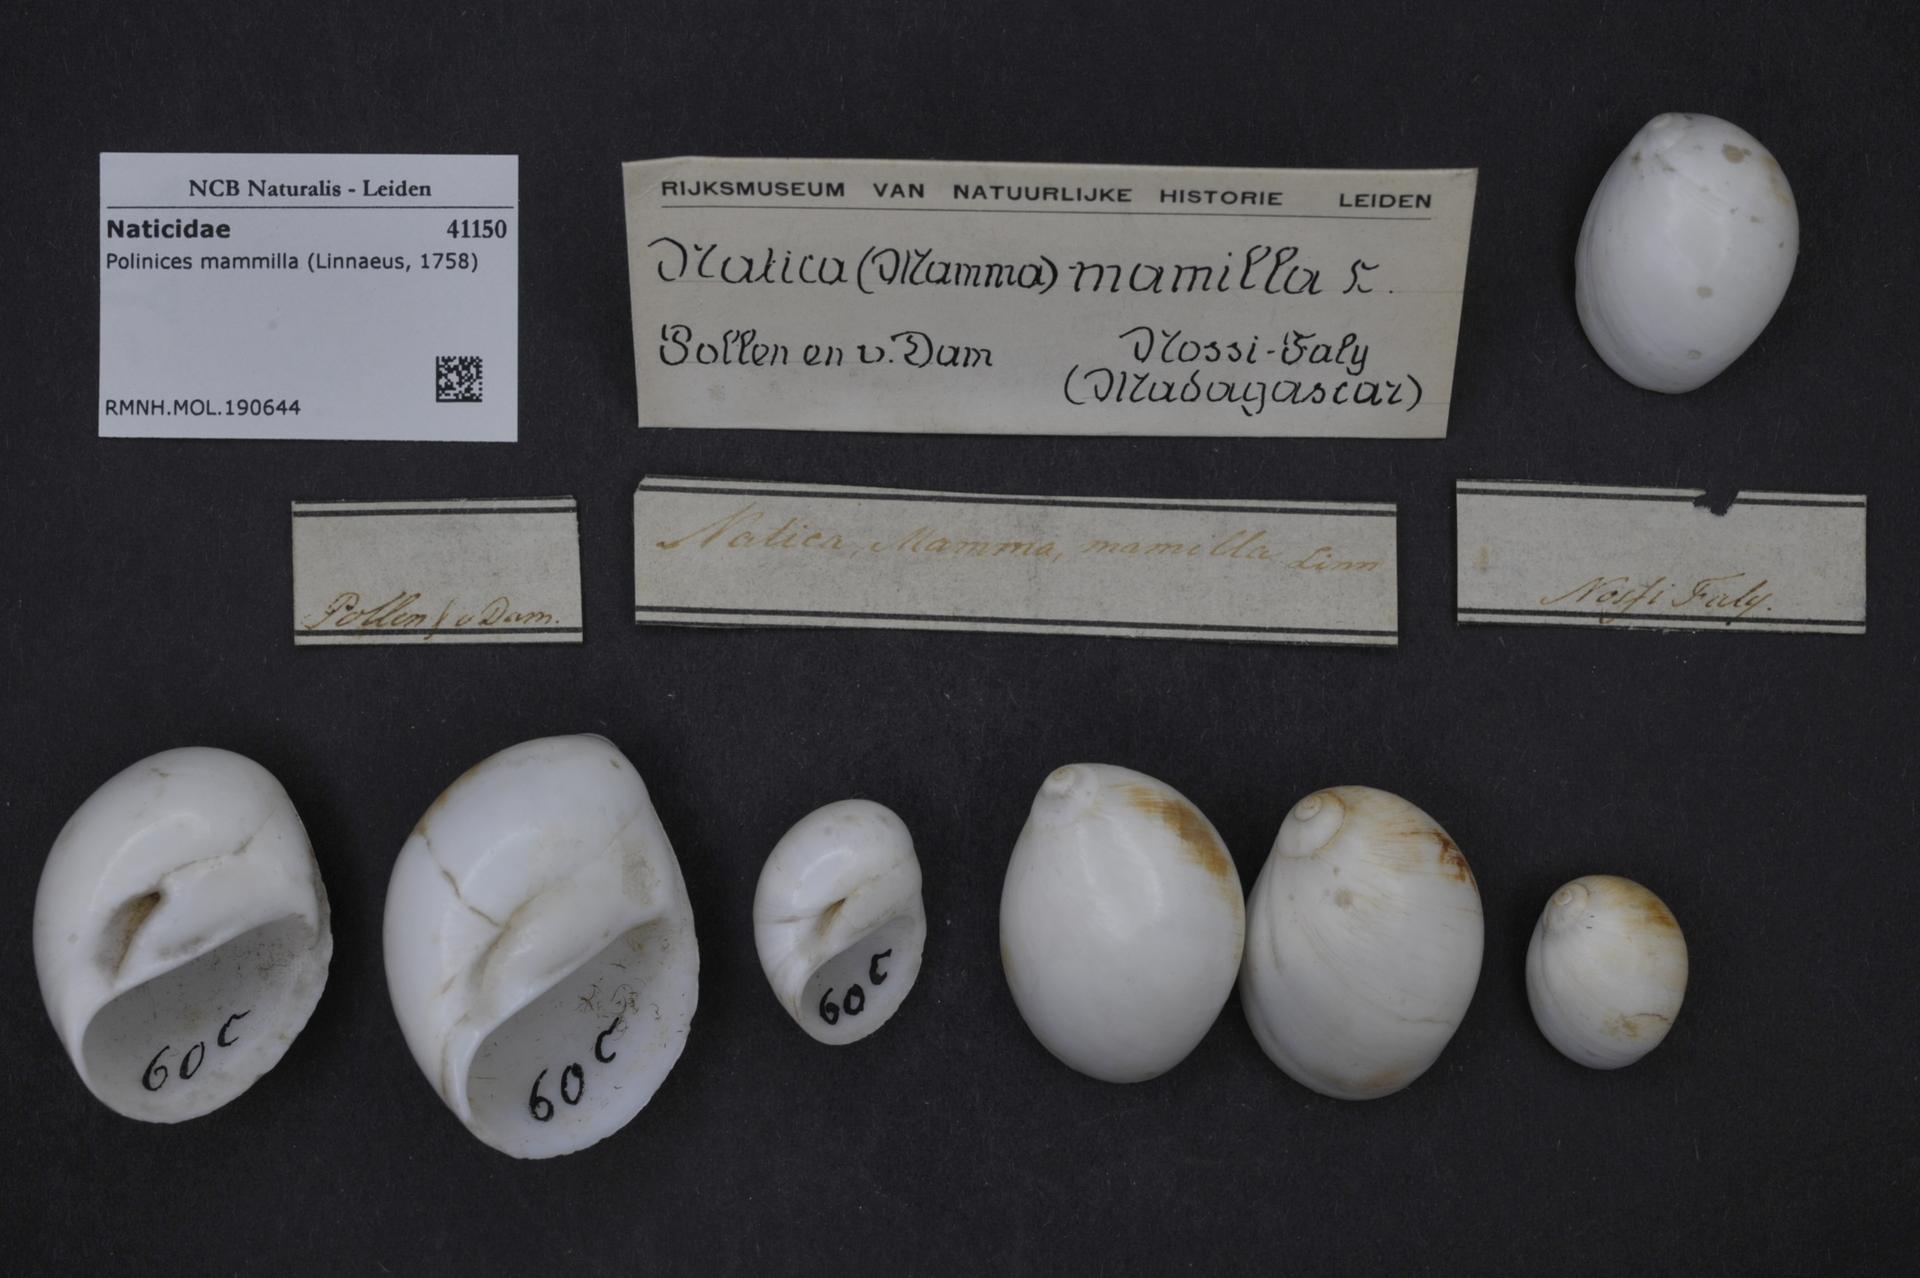 RMNH.MOL.190644 | Polinices mammilla (Linnaeus, 1758)